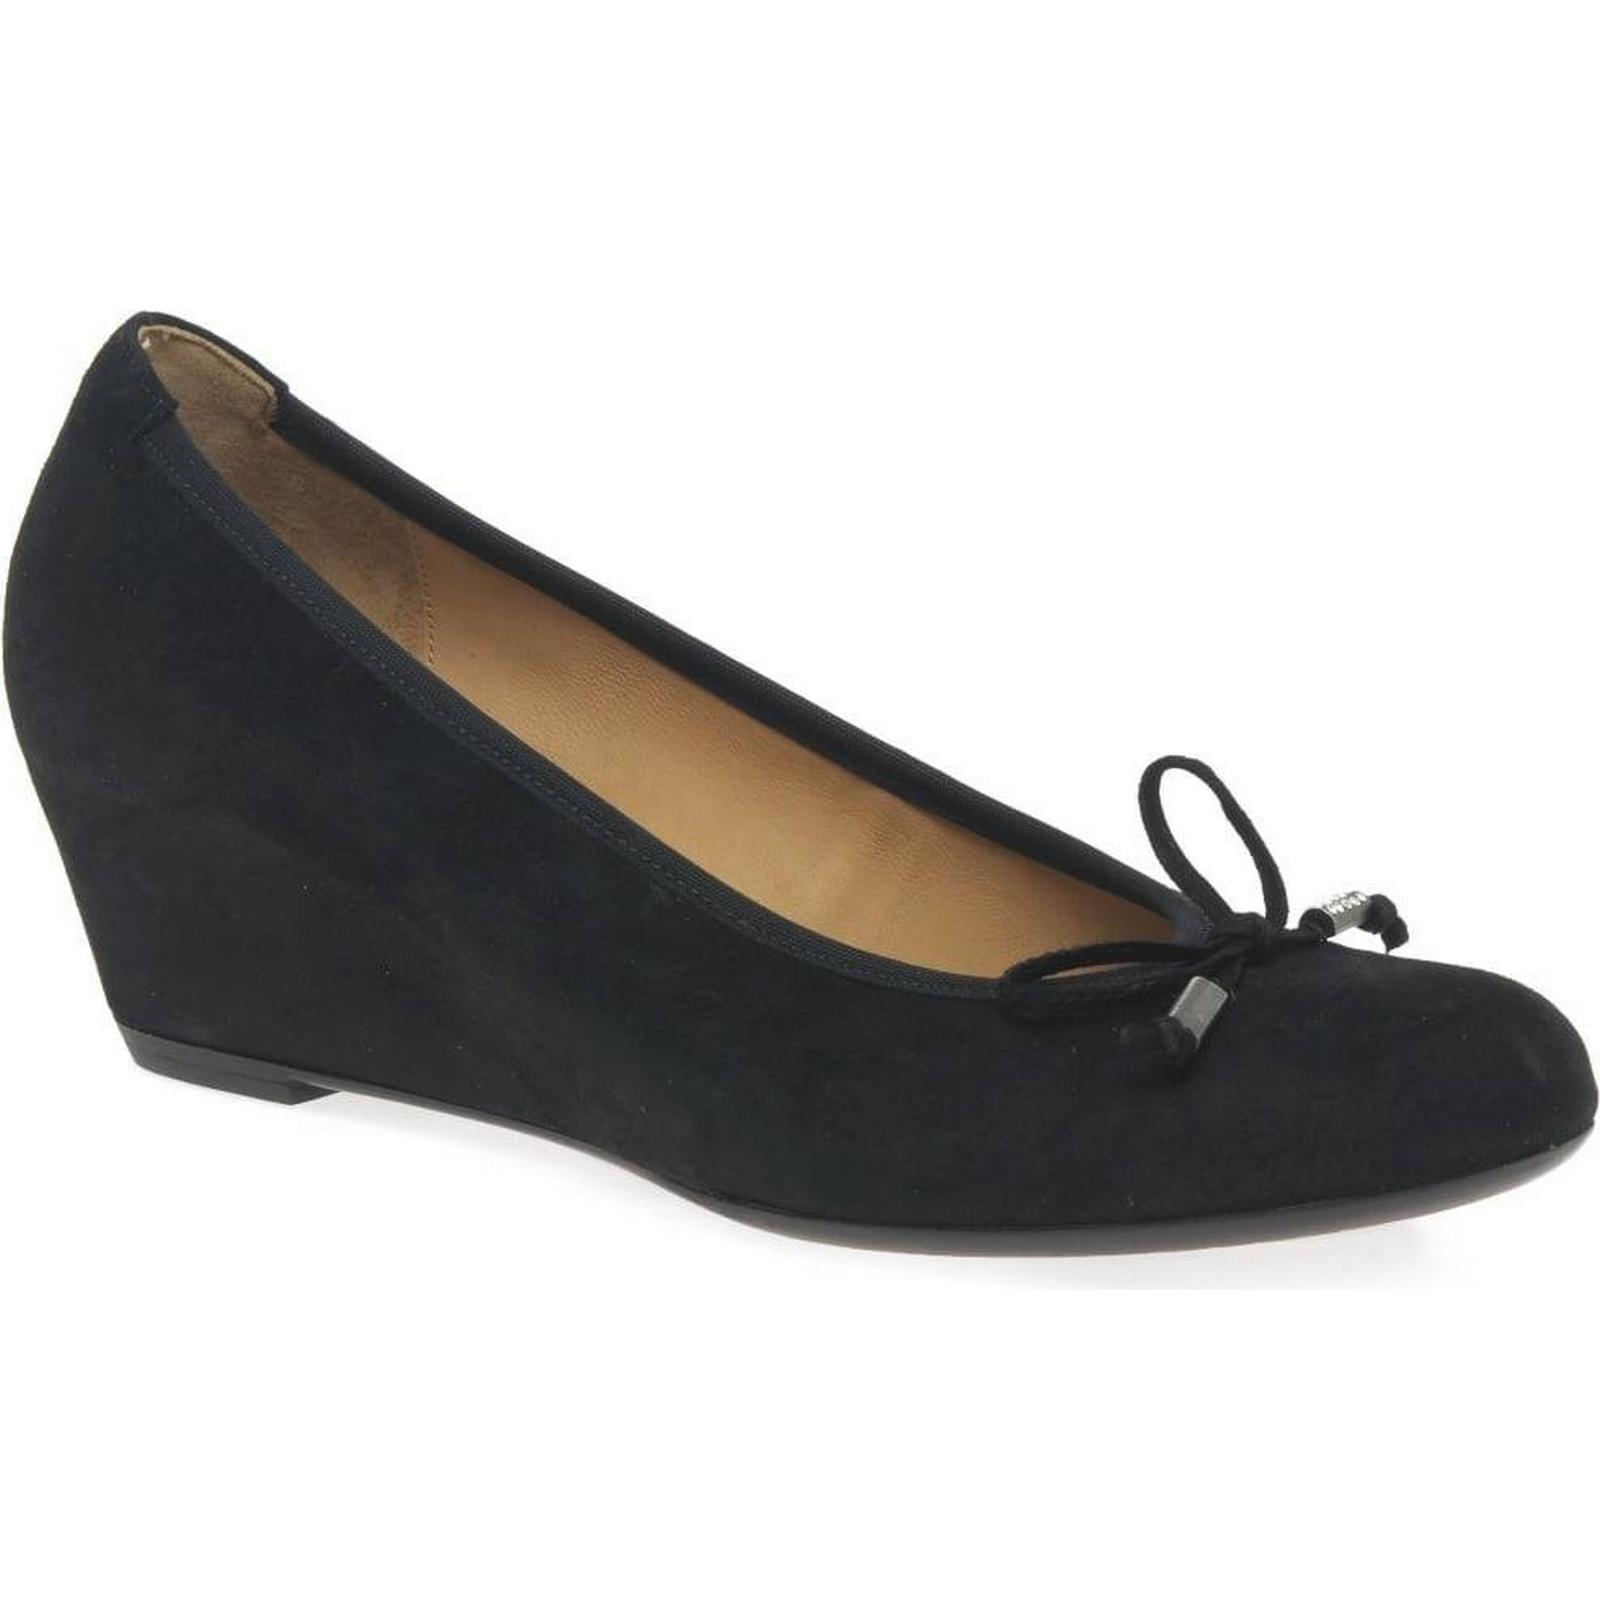 Gabor Alvin Black Womens Casual Shoes Colour: Black Alvin Suede, Size: 6.5 1ed96f